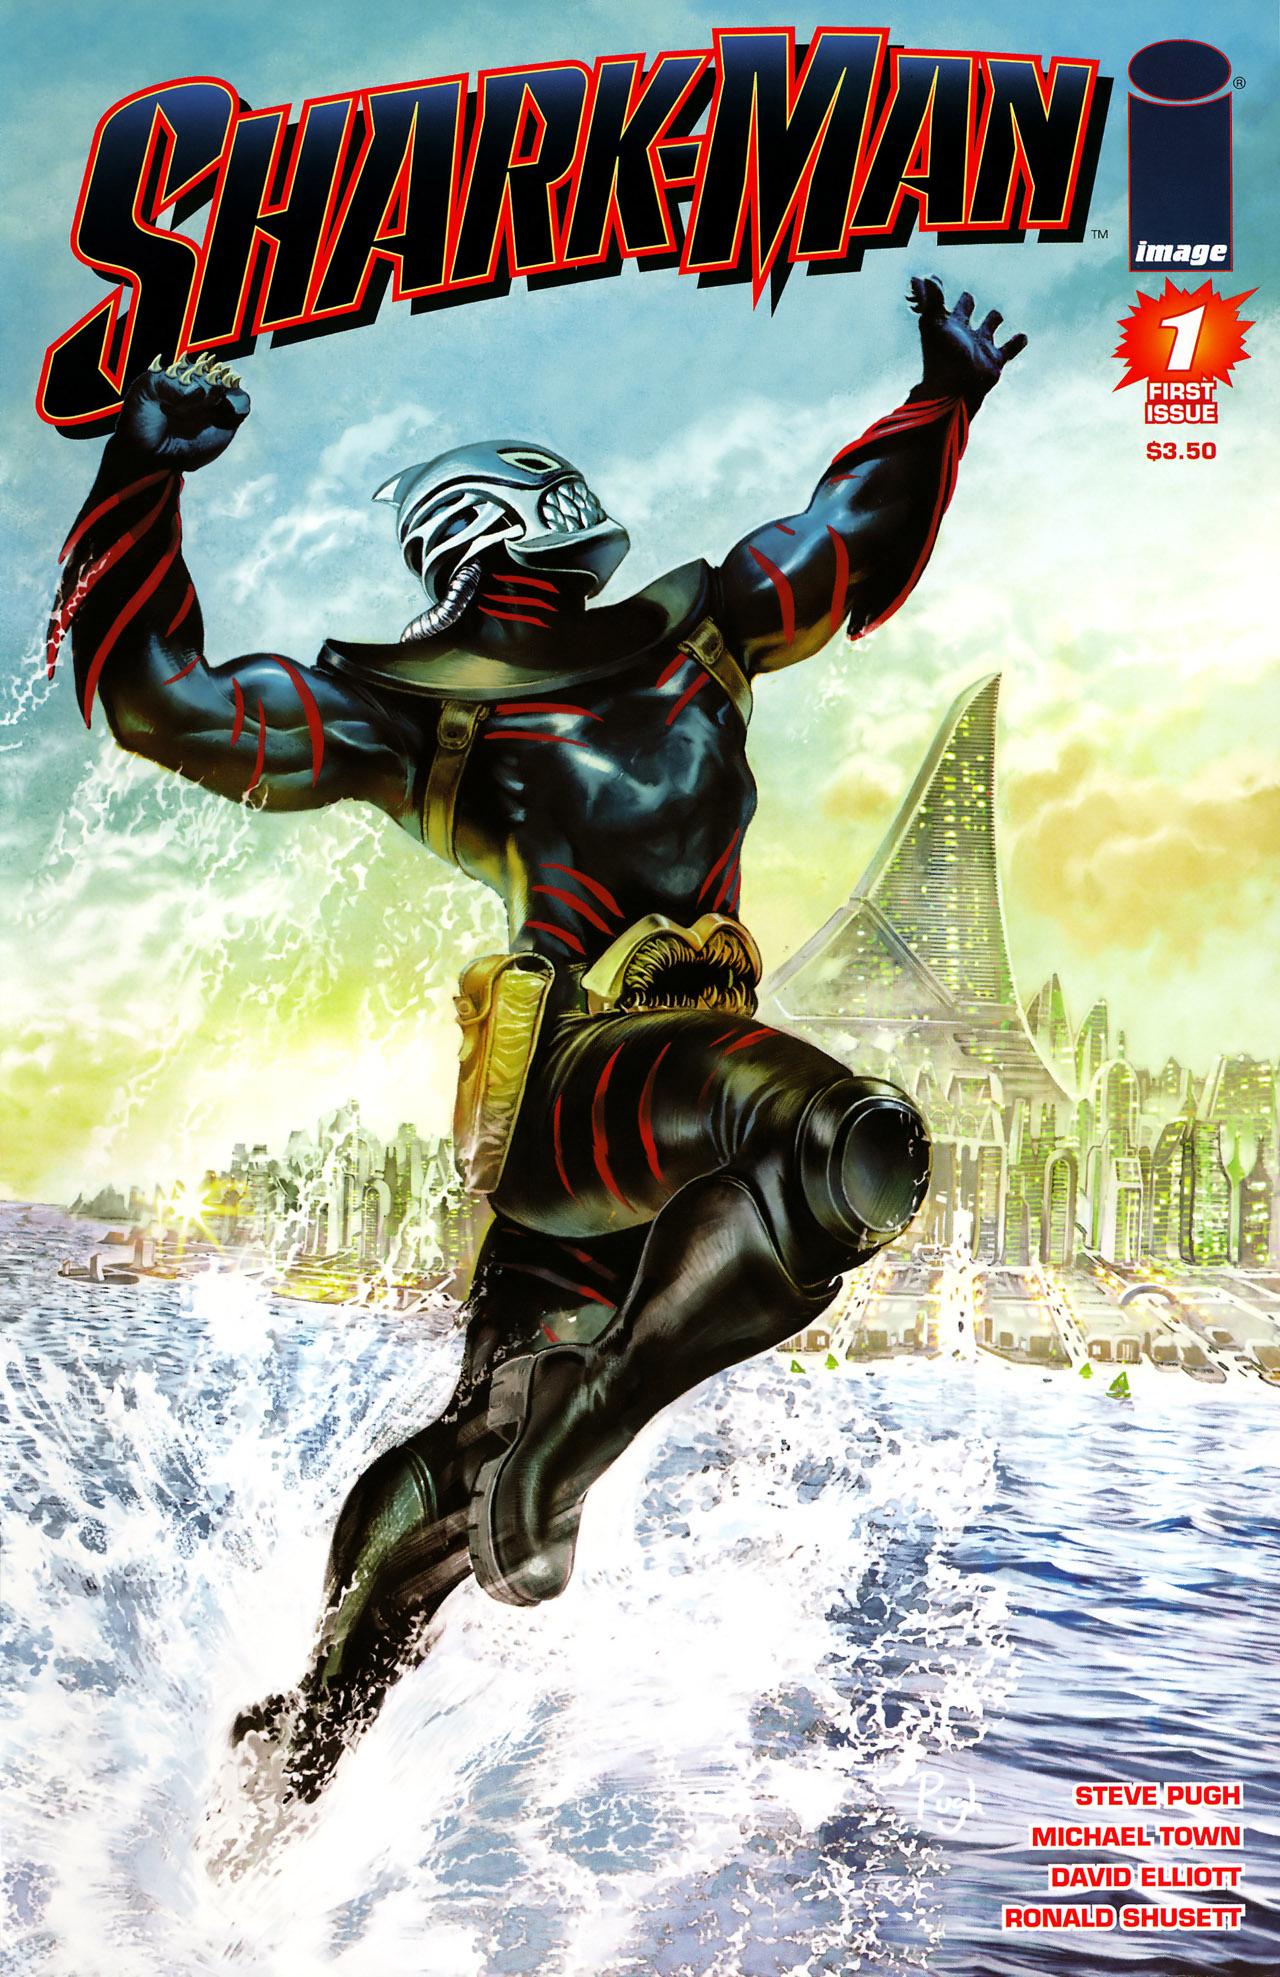 Read online Shark-Man comic -  Issue #1 - 1